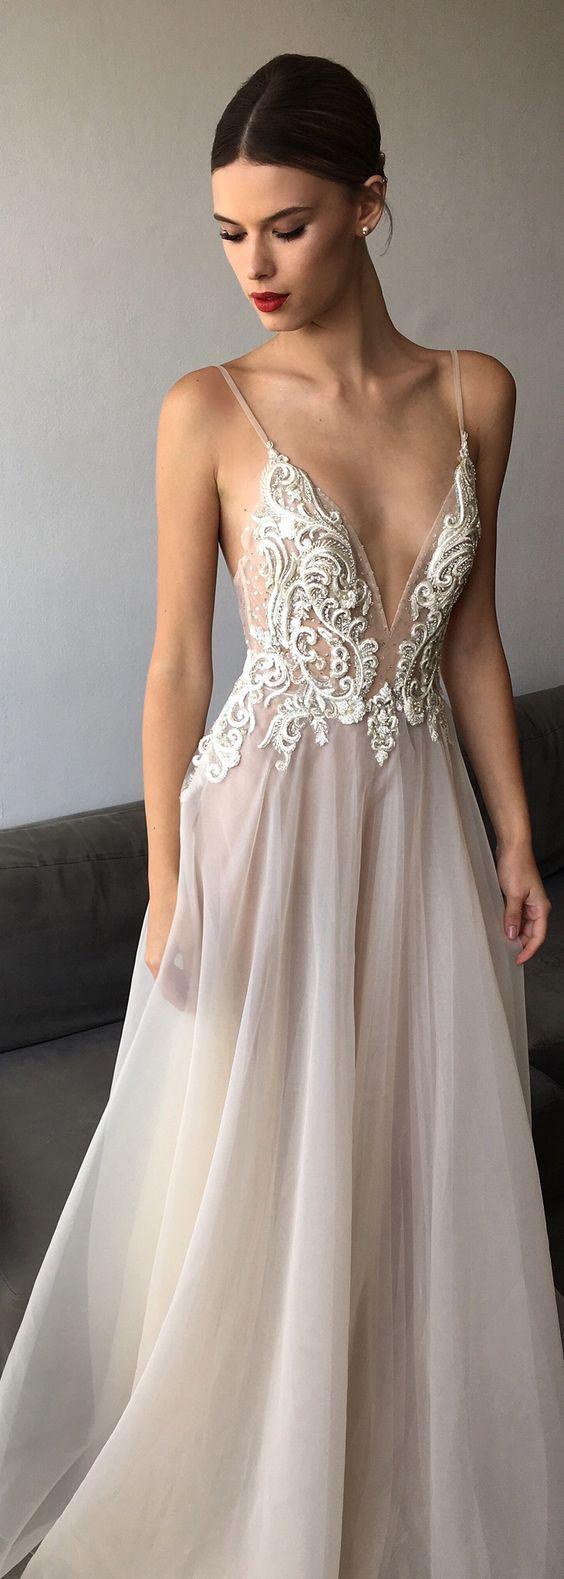 V-neck Spaghetti Strap Dress,Sexy Stuning Dress,New Arrival Open Back Dress,48